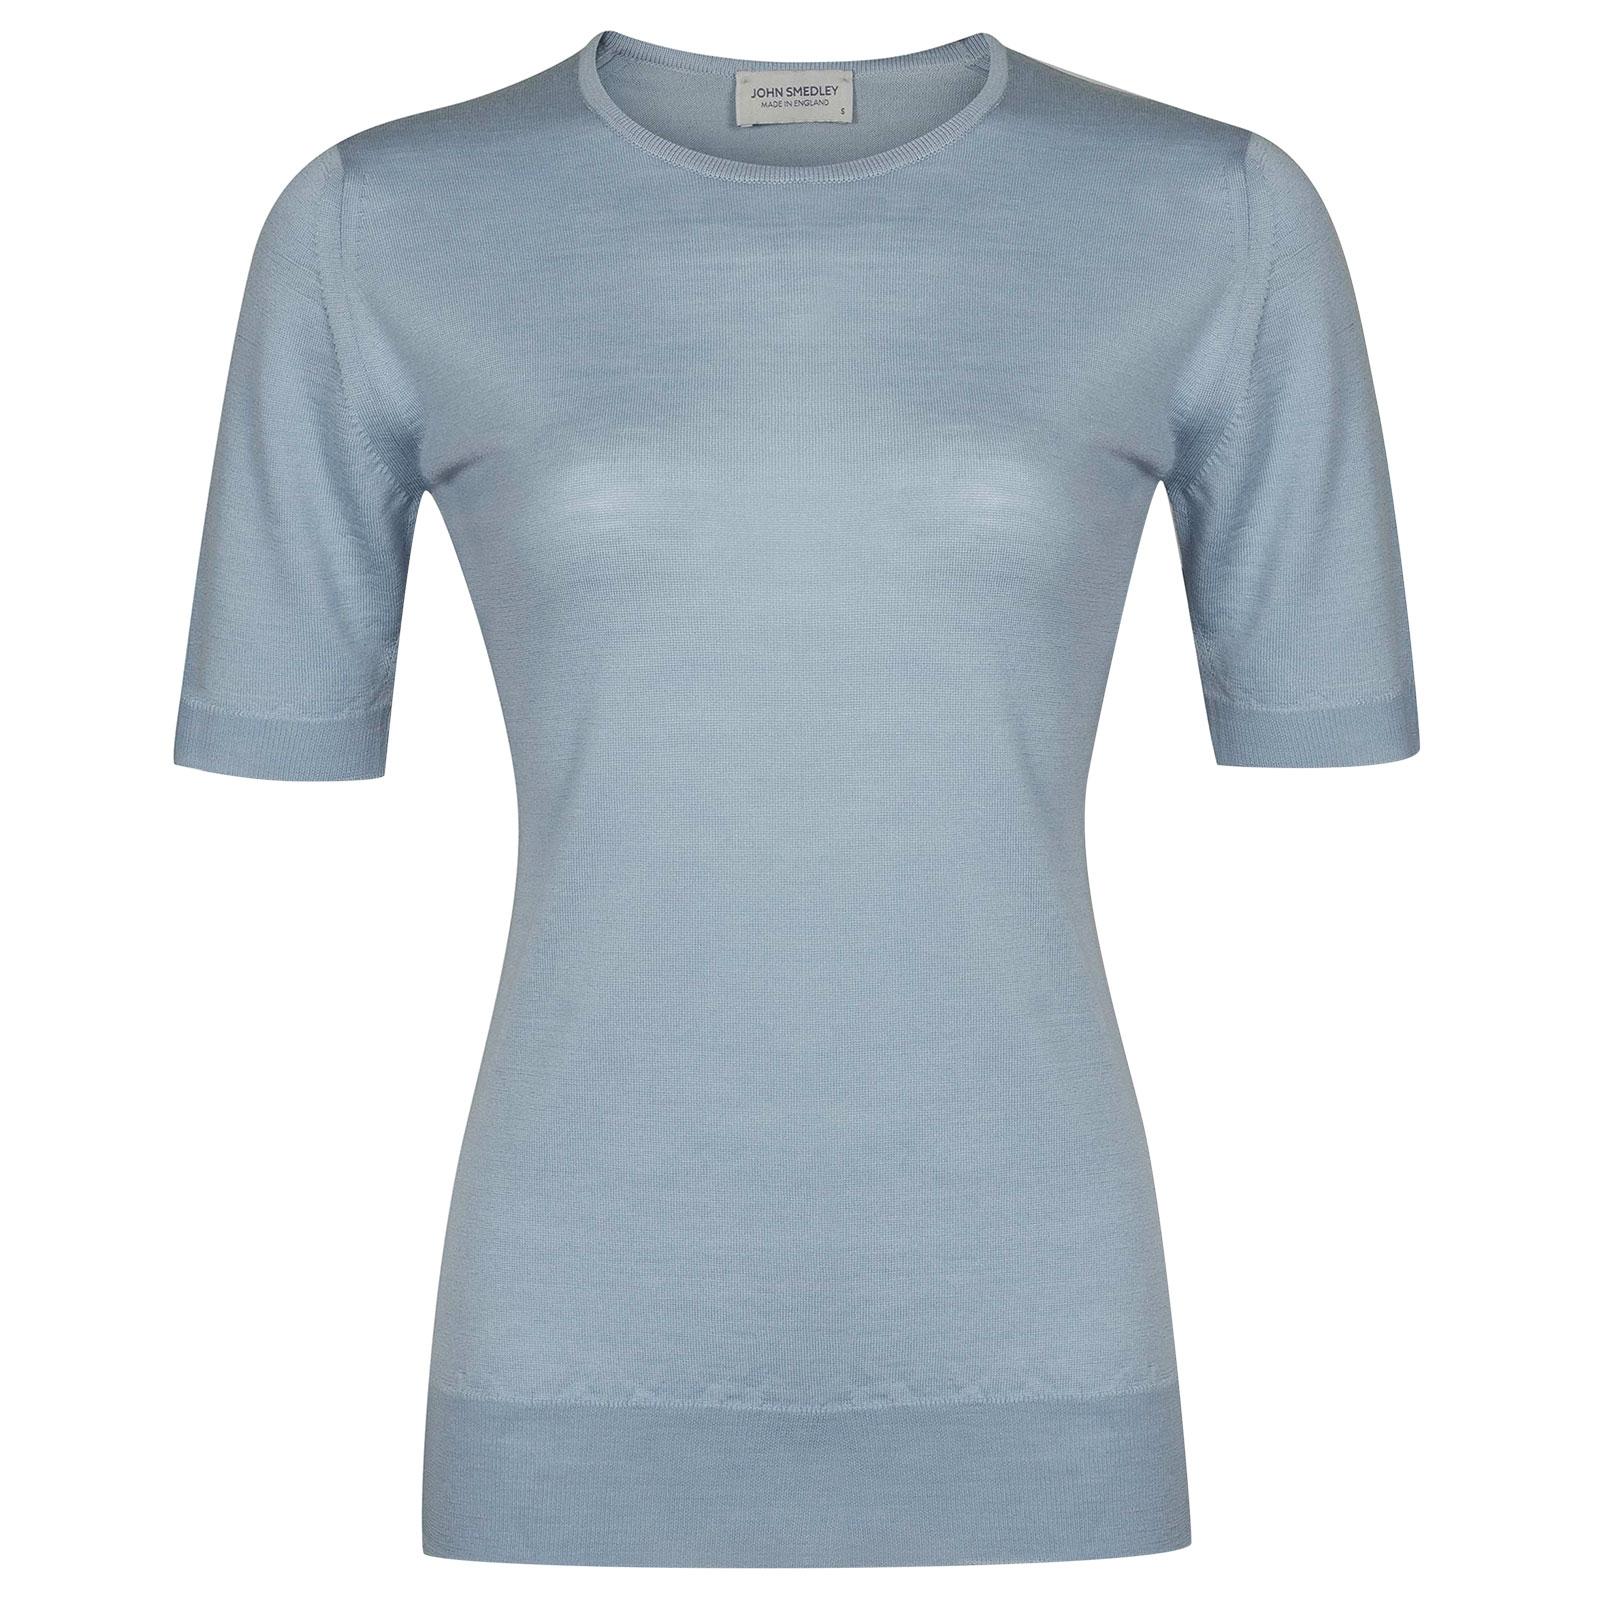 John Smedley Rietta in Dusk Blue Sweater-XLG